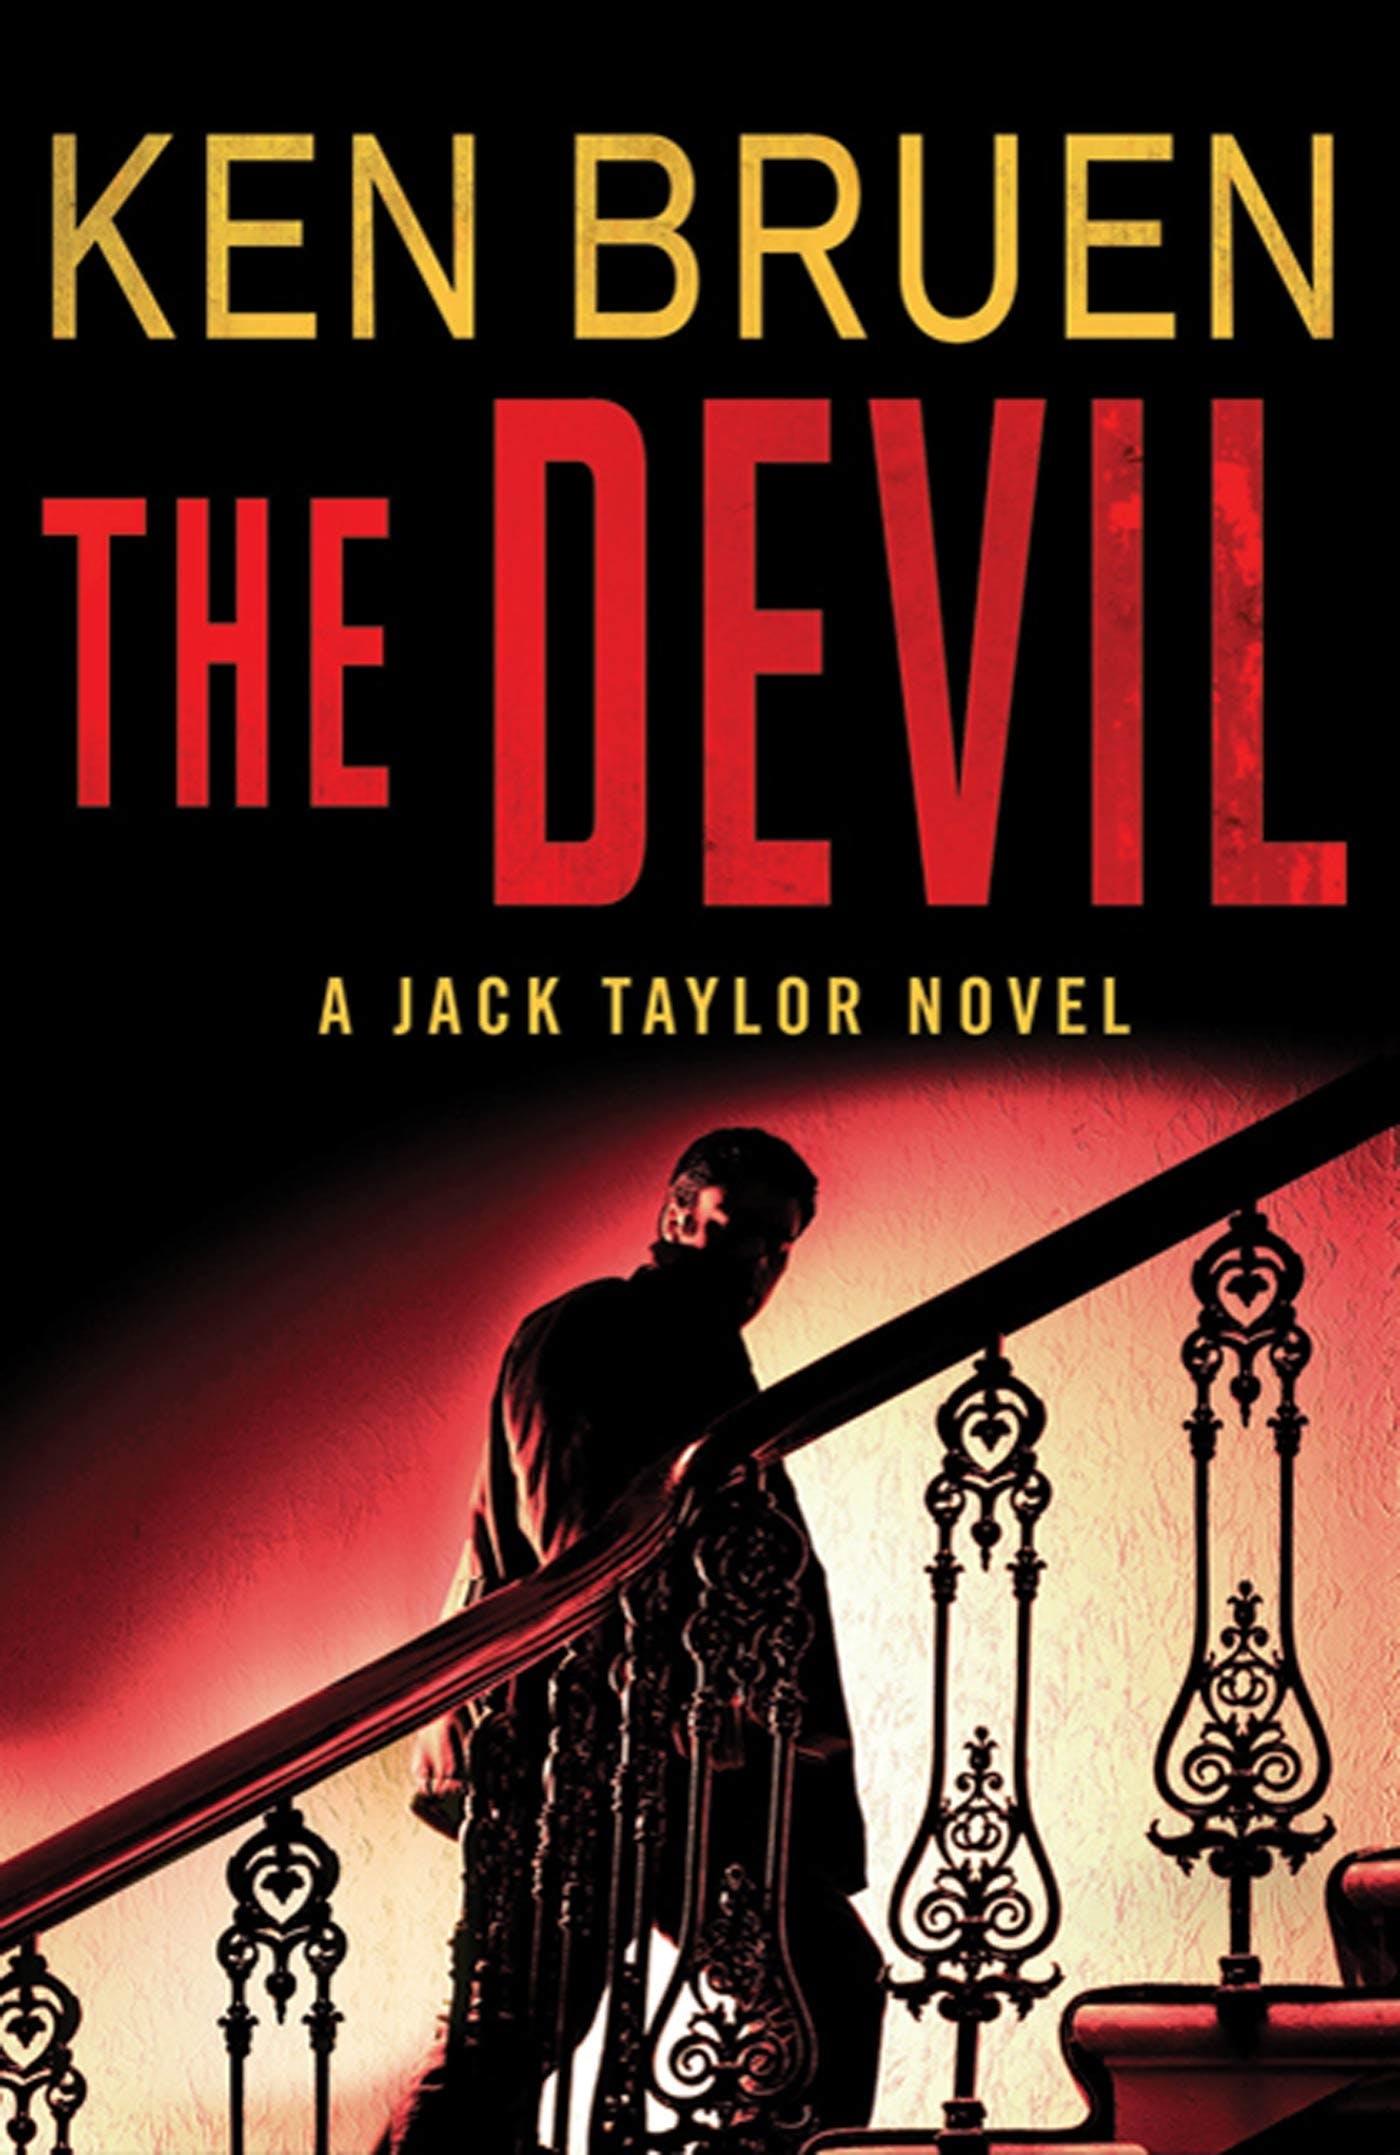 Image of The Devil